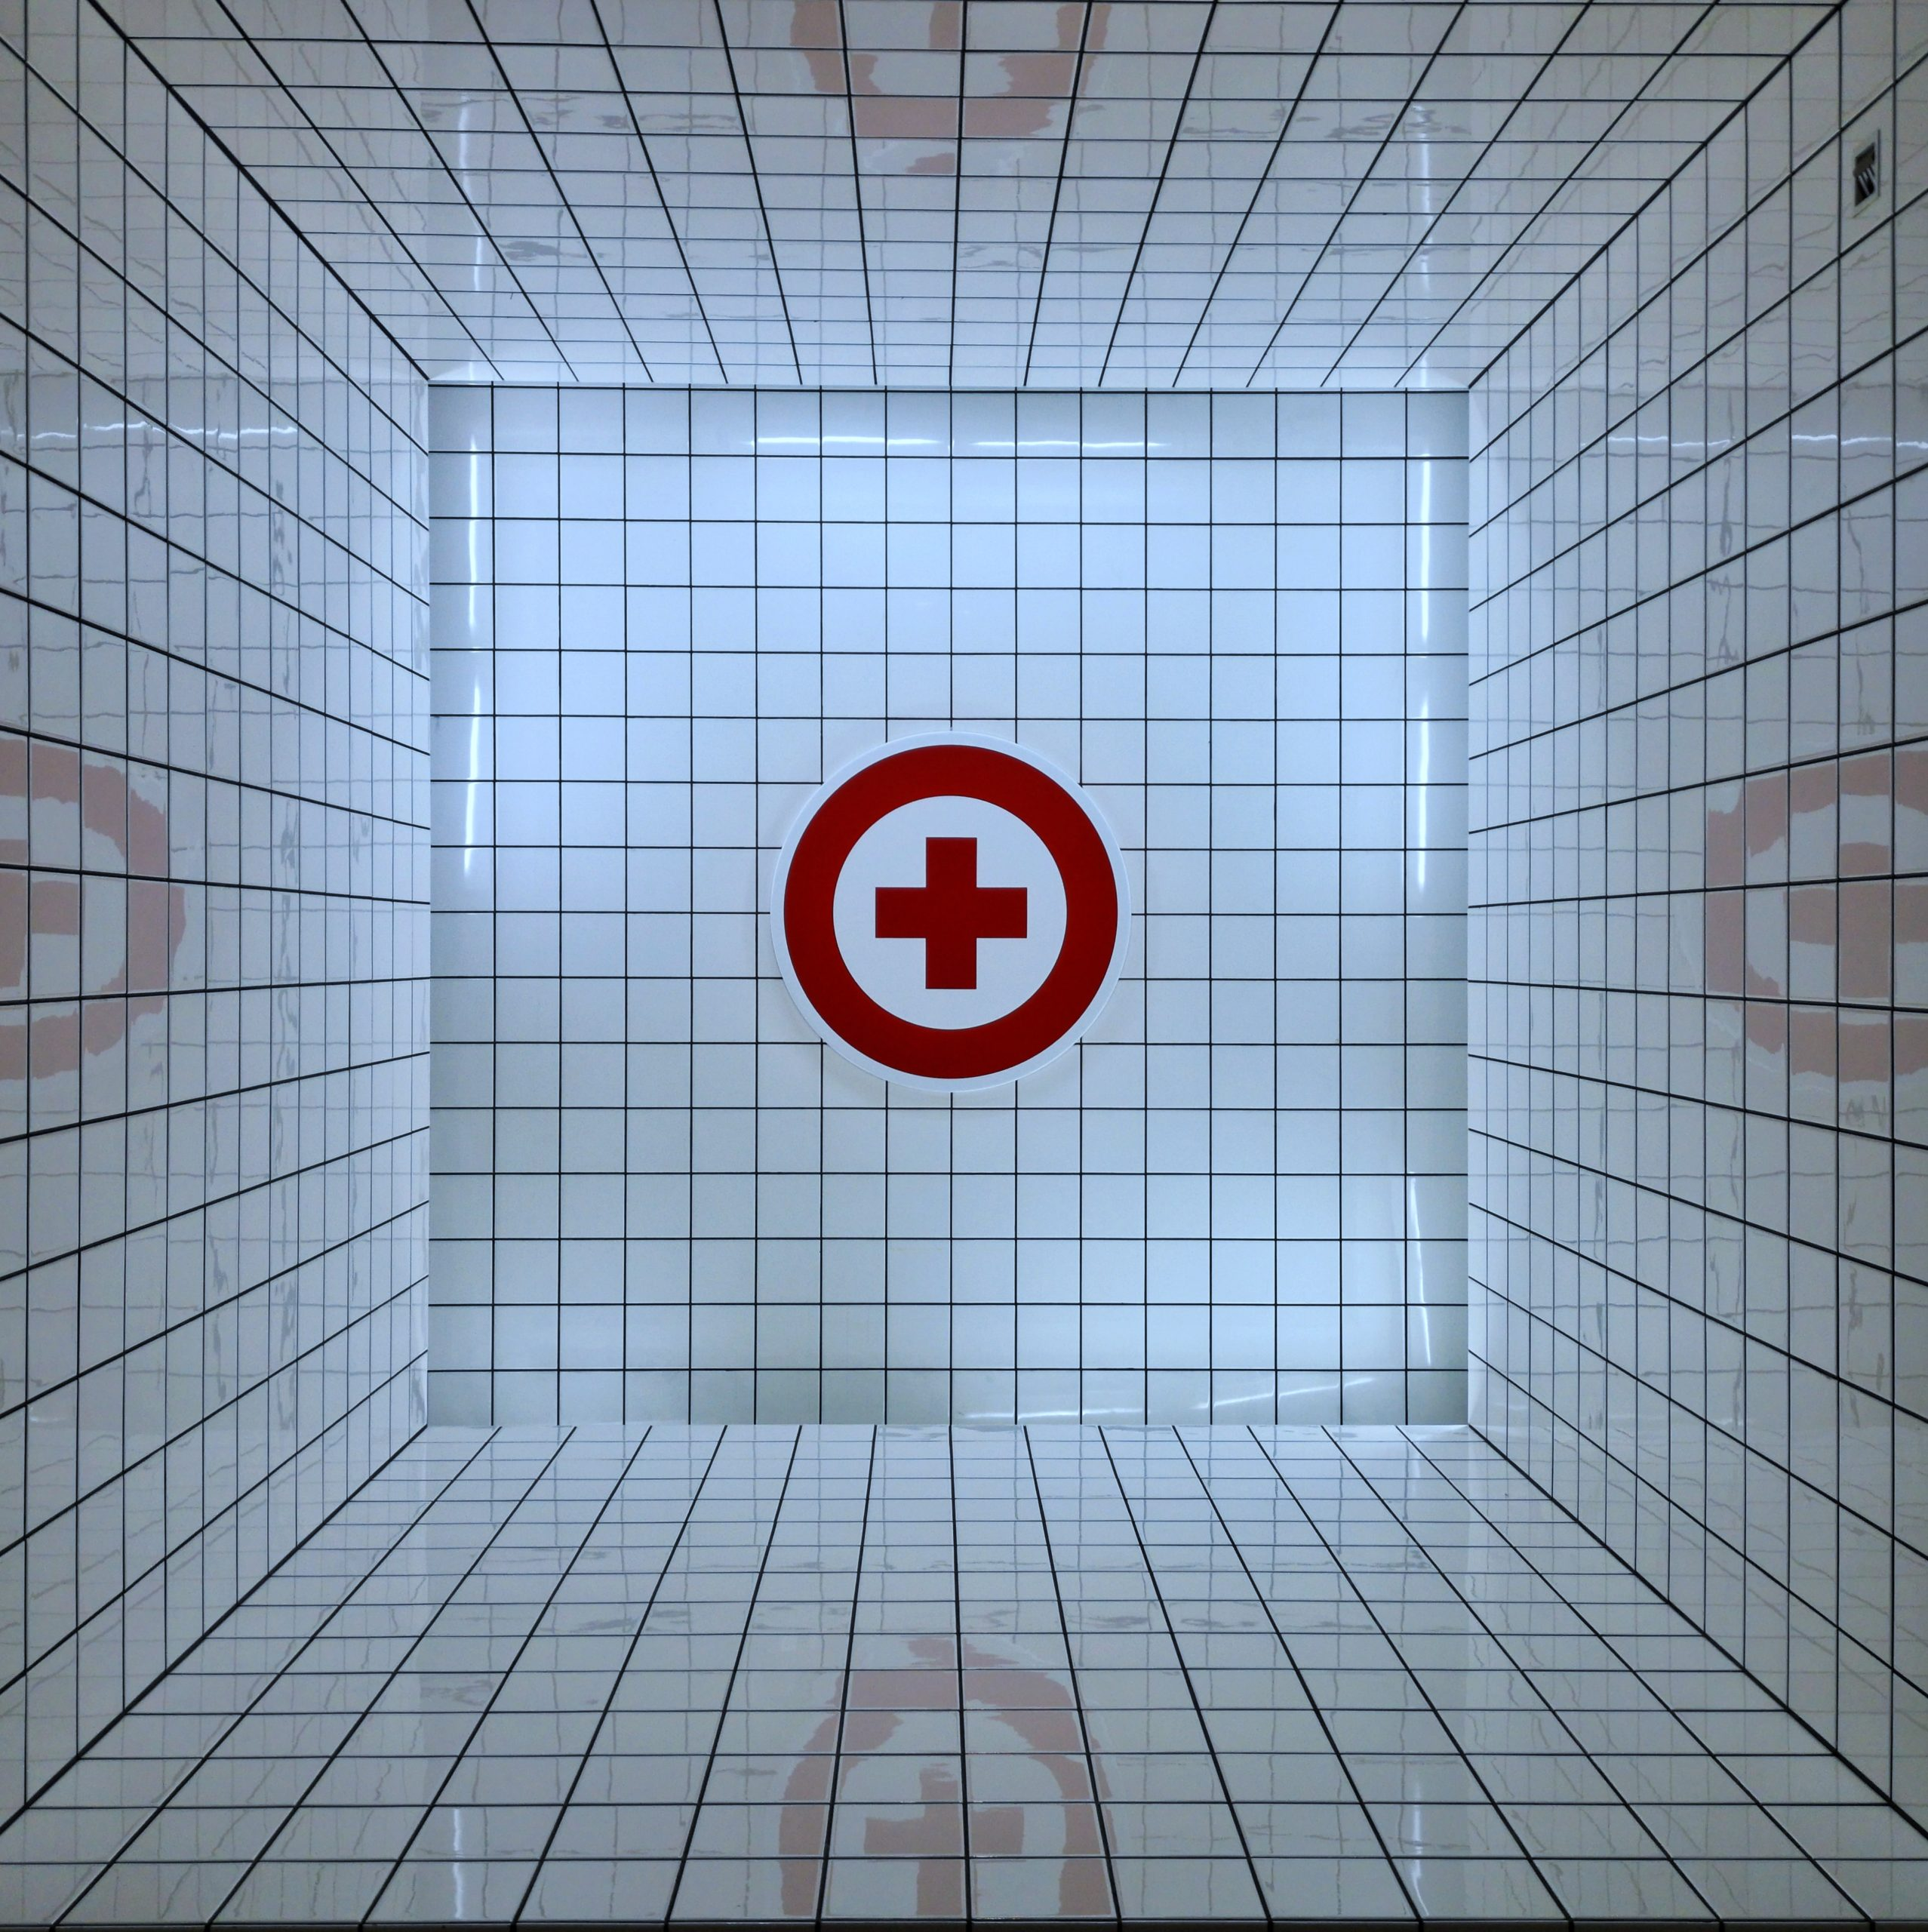 Photo of emergency symbol